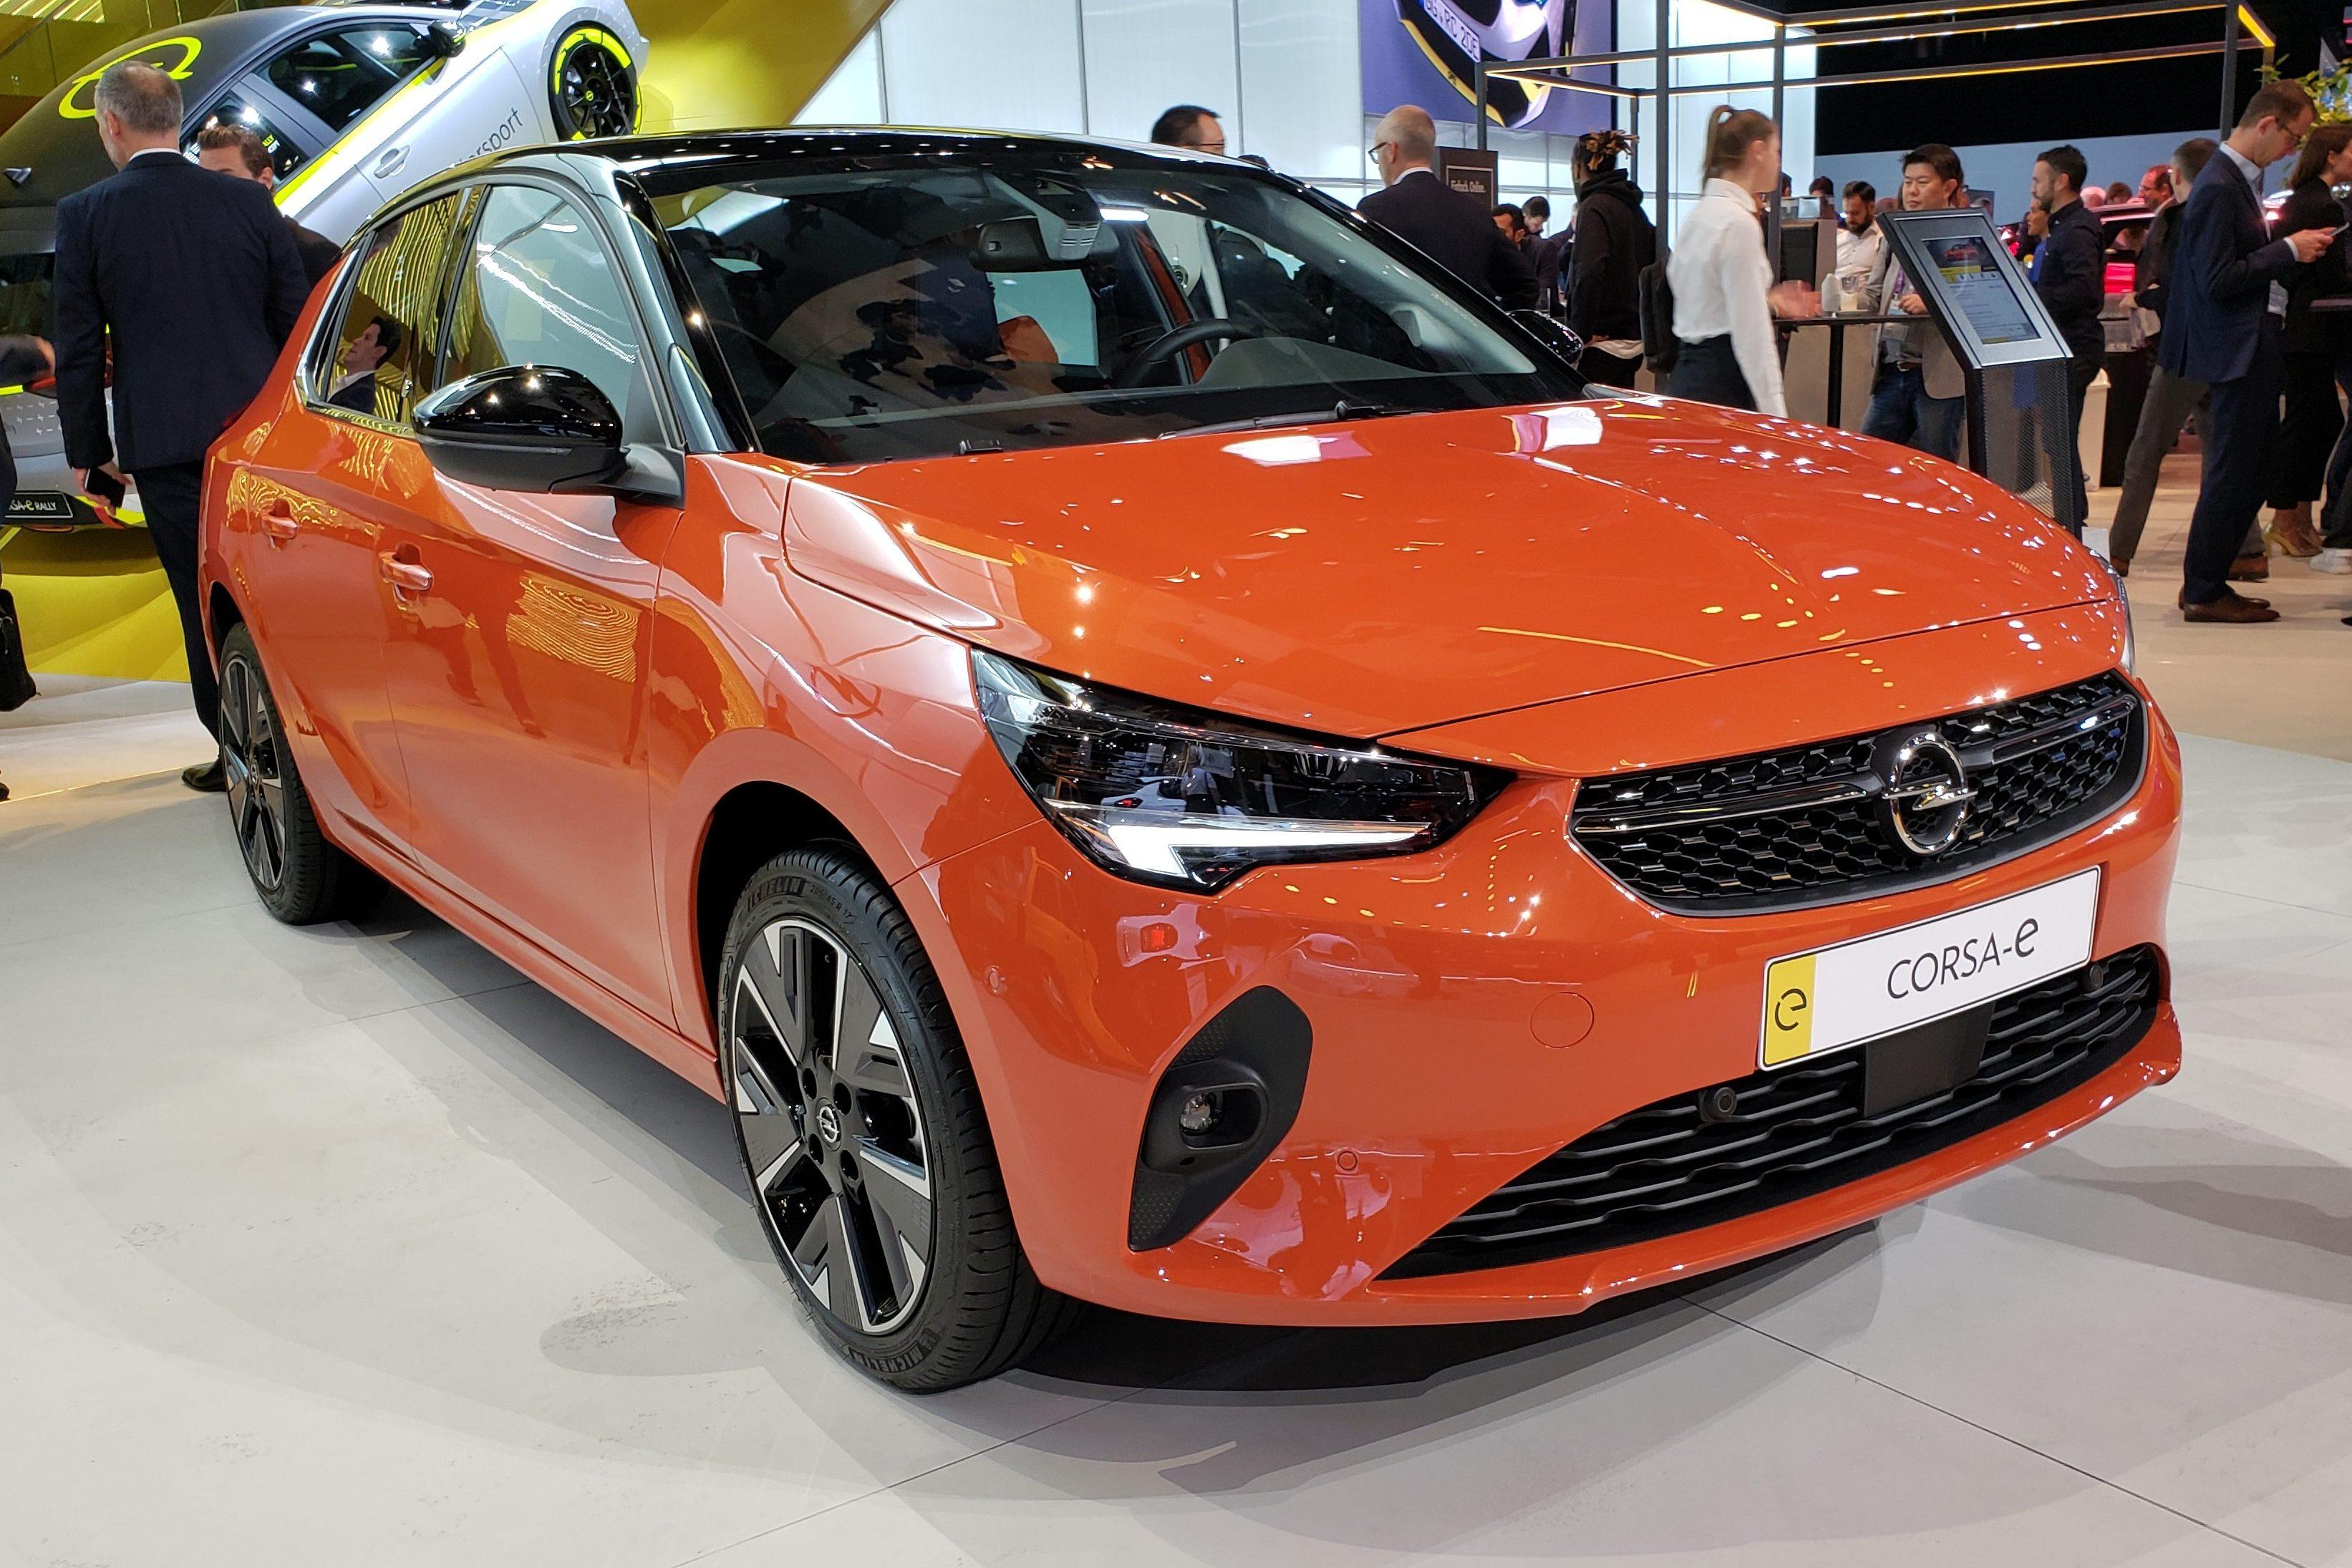 Corsa Astra Zafira Carros Da Francesa Opel Que Queriamos No Brasil Quatro Rodas